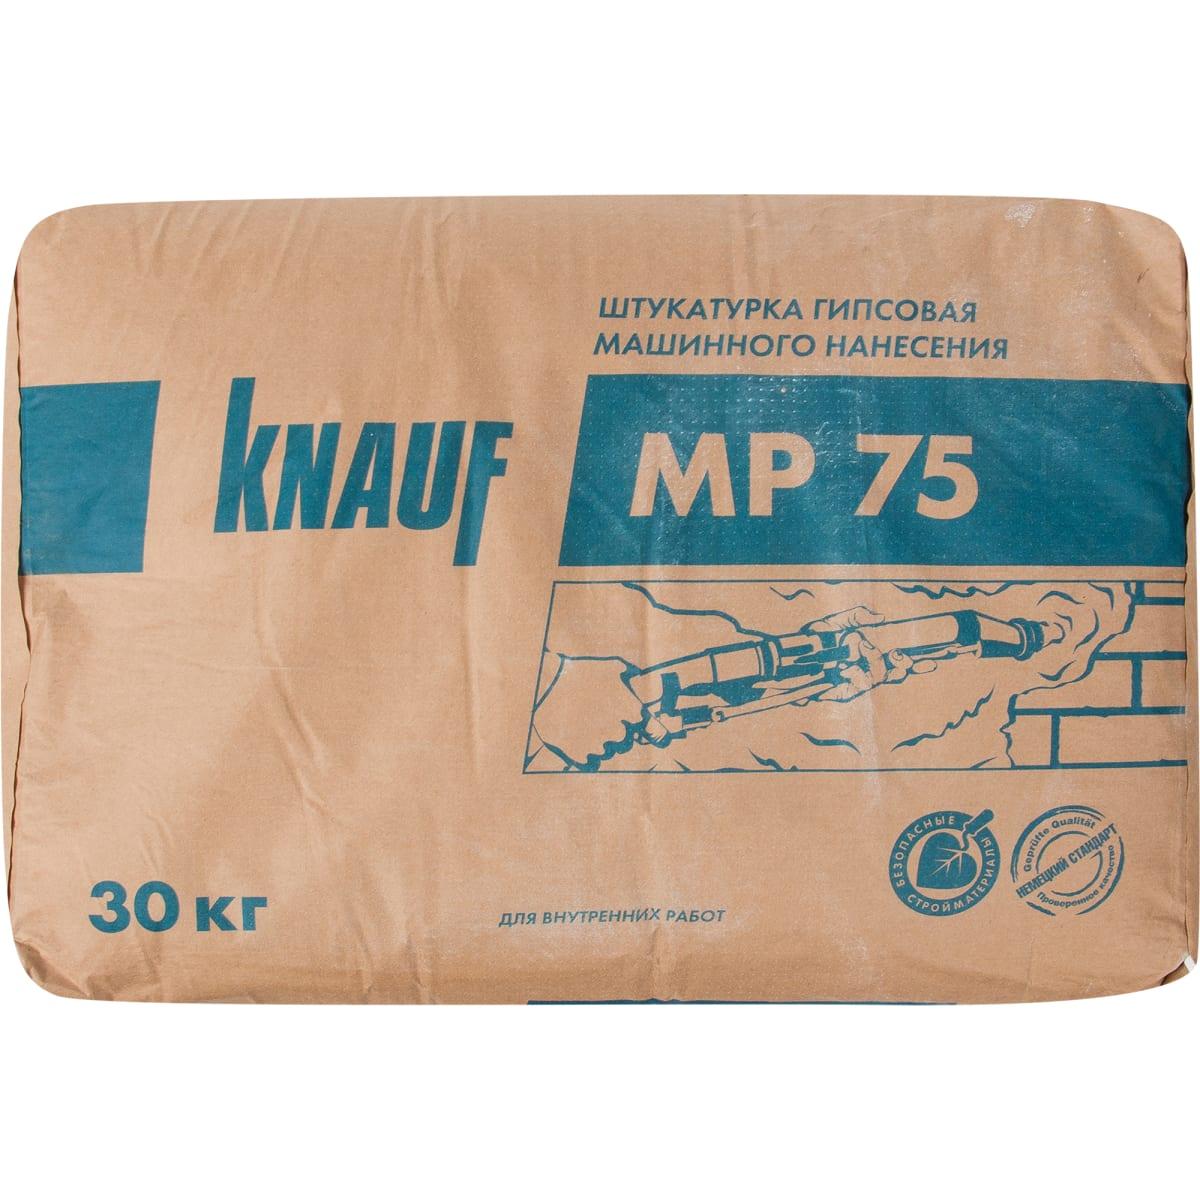 Штукатурка гипсовая Knauf MP 75 30 кг